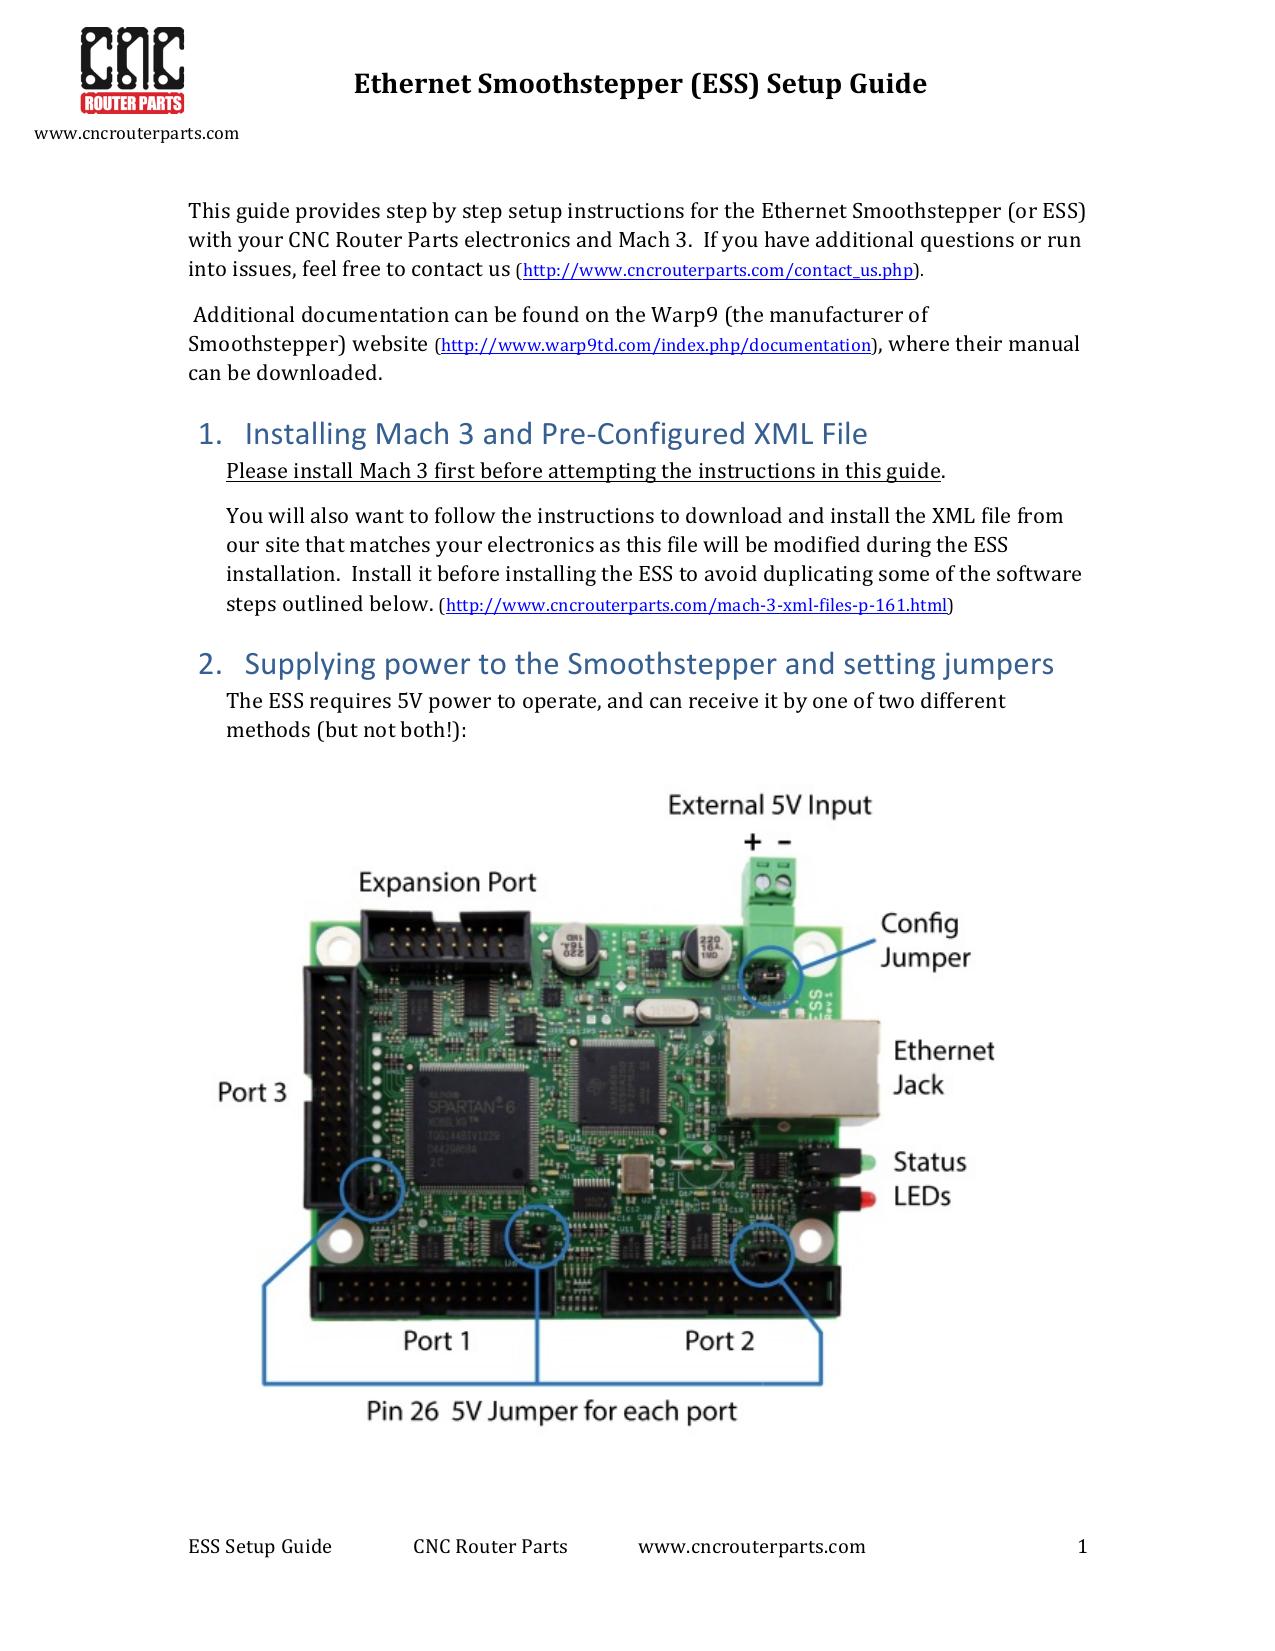 Ethernet Smoothstepper Instructions | manualzz com